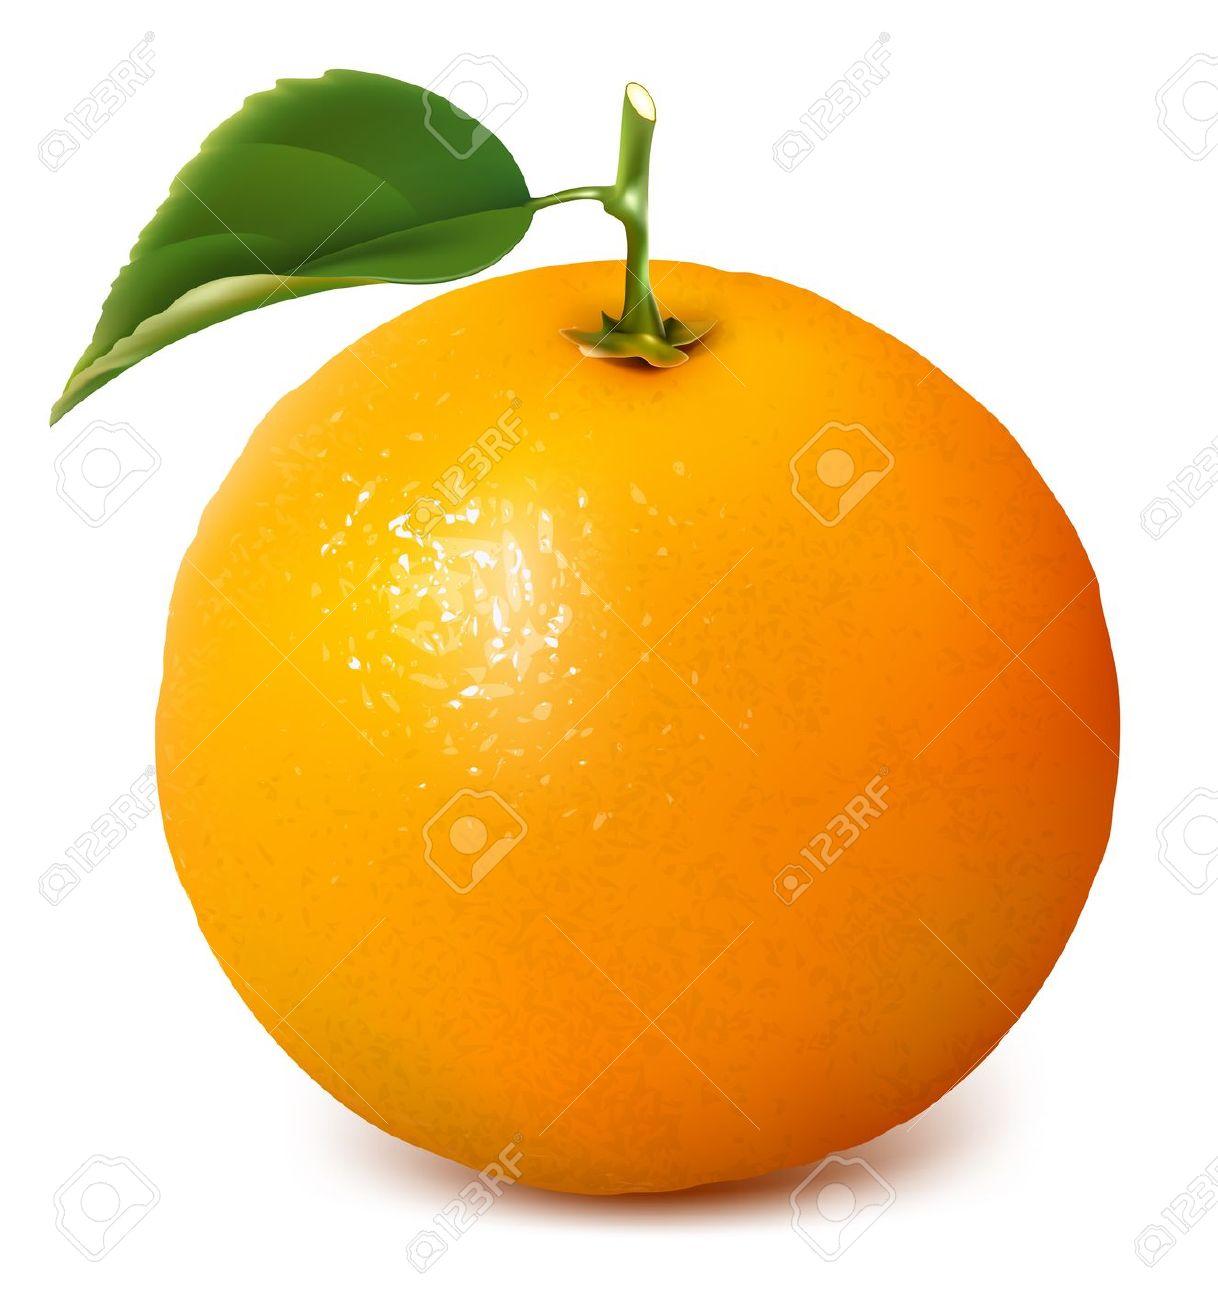 Best Orange Clipart #13374.